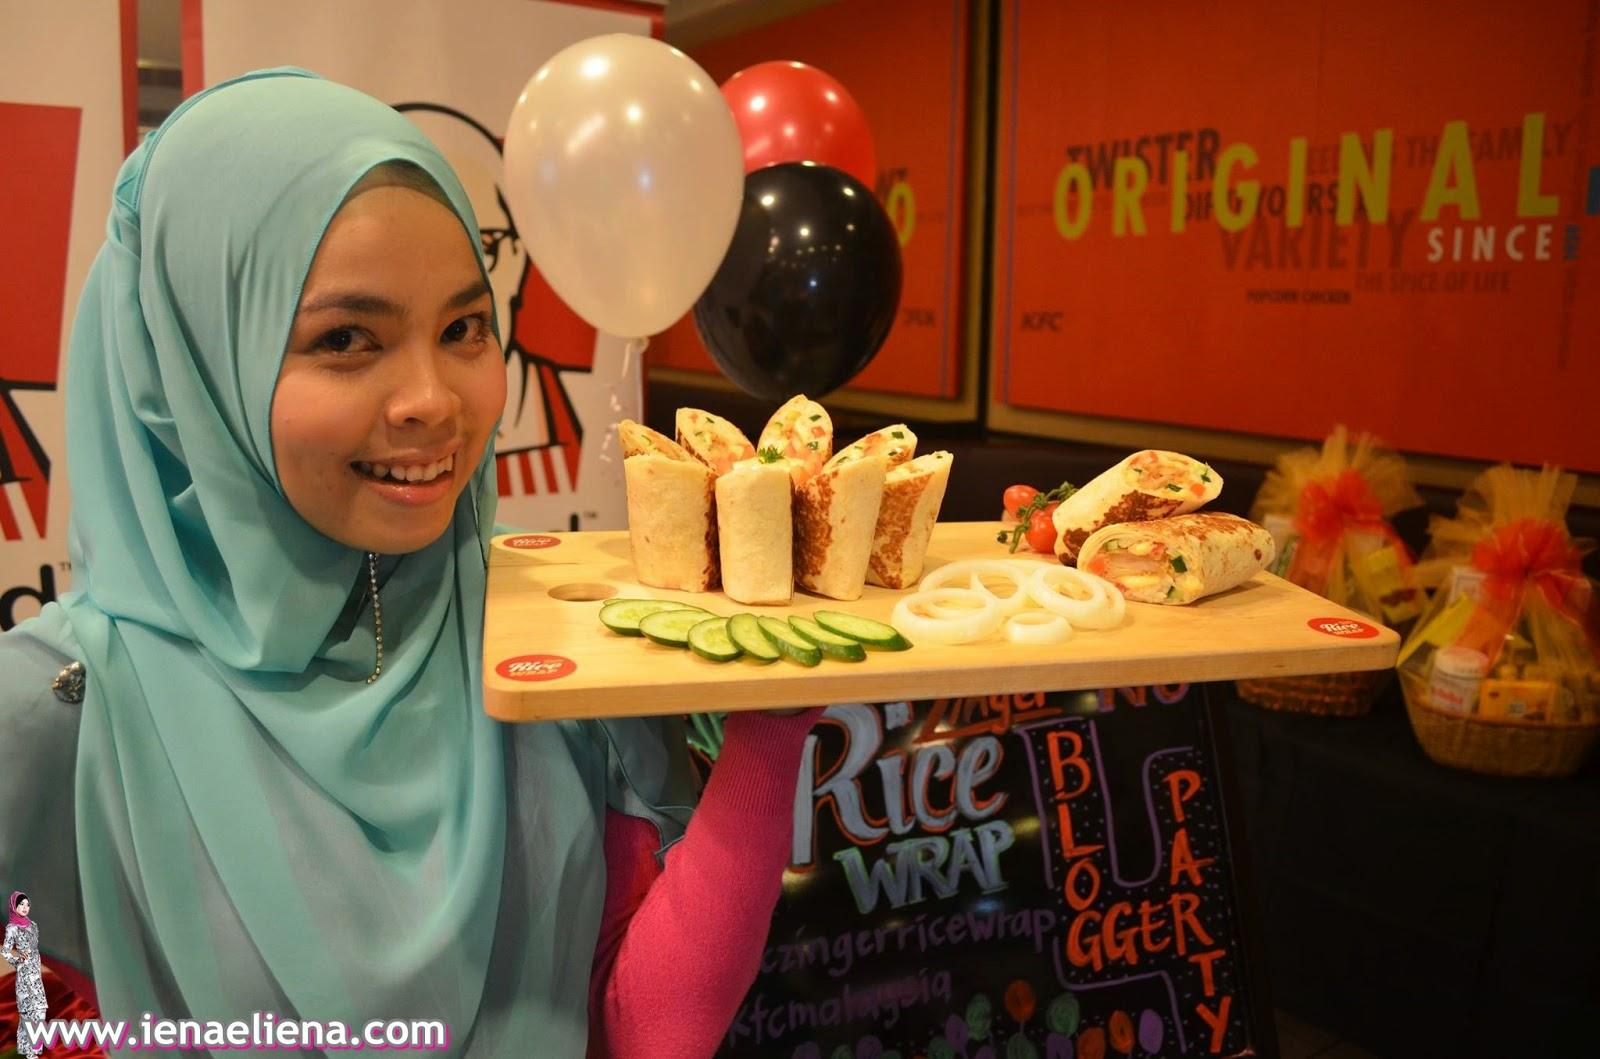 Model Muslimah KFC Zinger Rice Wrap